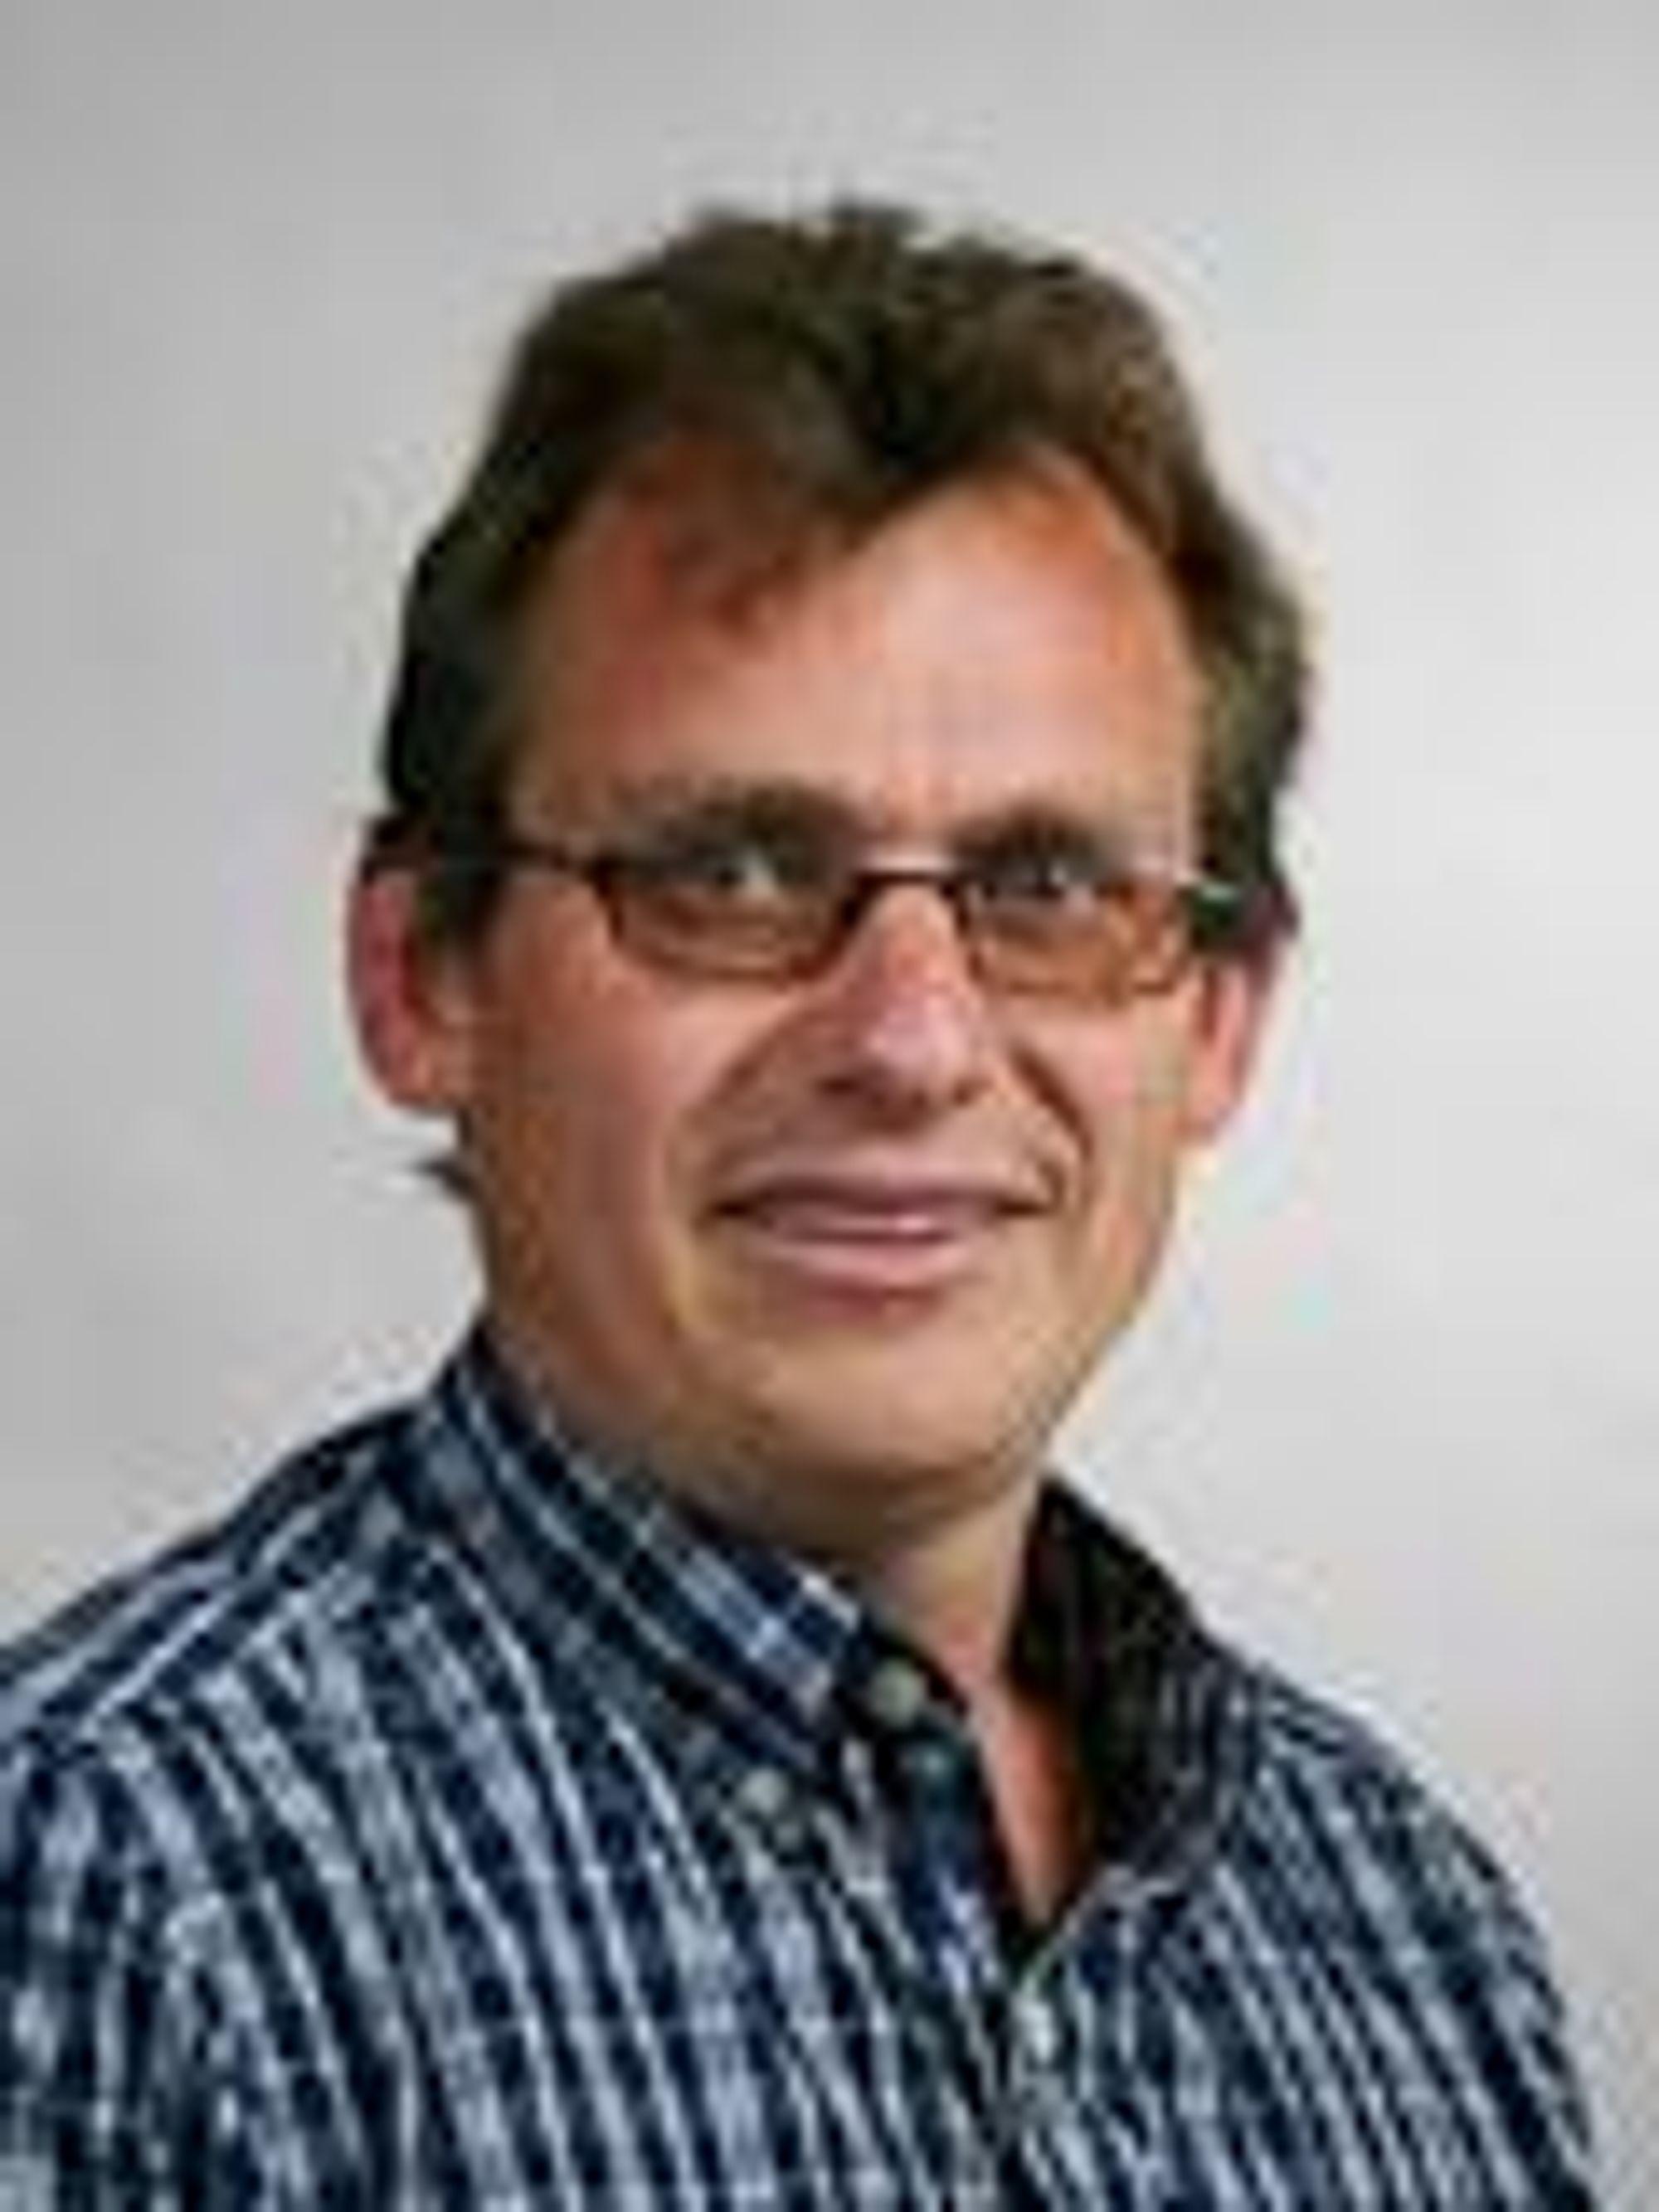 Gert Frølund Pedersen er professor ved Aalborgs universitet.